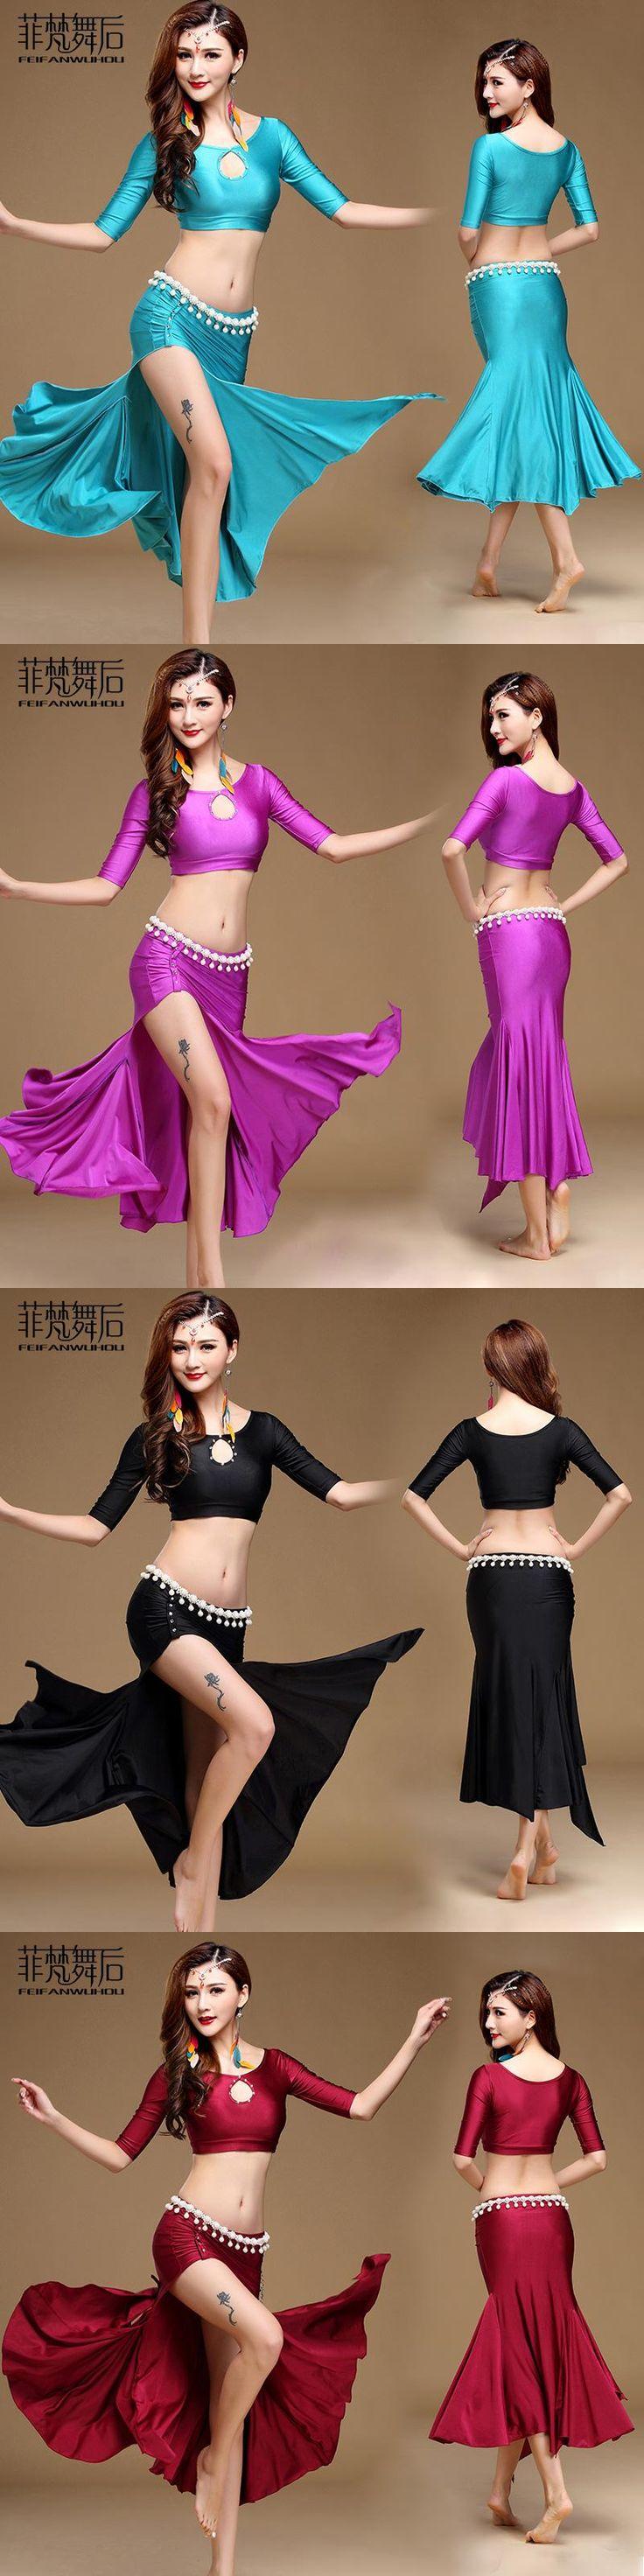 FEIFANWUHOU Belly Dance Set For Women Half Sleeve Crop Top + Side Split Skirt Sexy Belly Dance Gypsy Costume Dancing Clothing